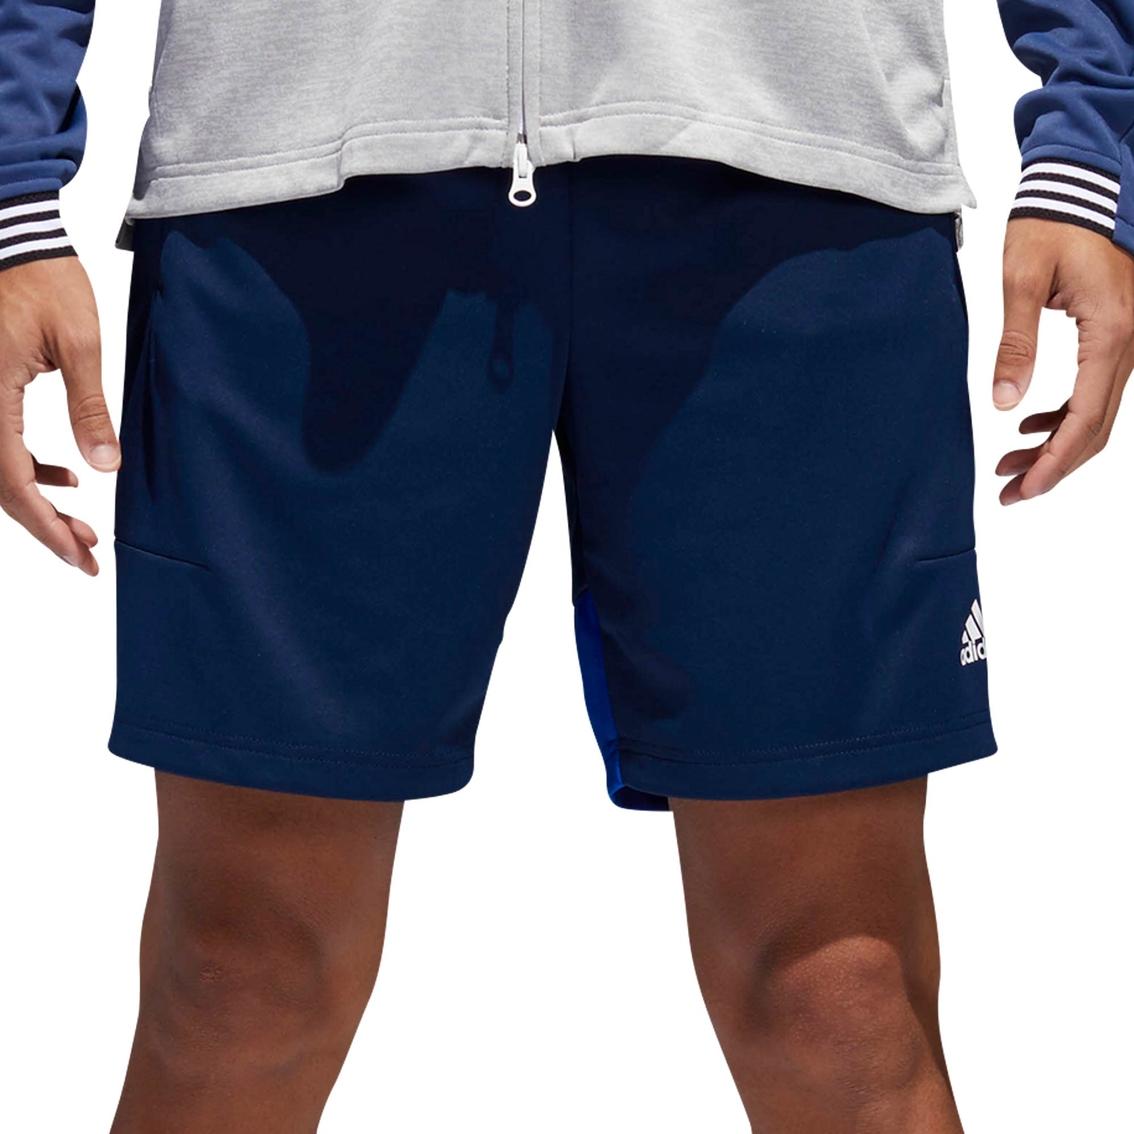 ec1224ac5 Adidas Team Issue Lite Shorts | Shorts | Apparel | Shop The Exchange